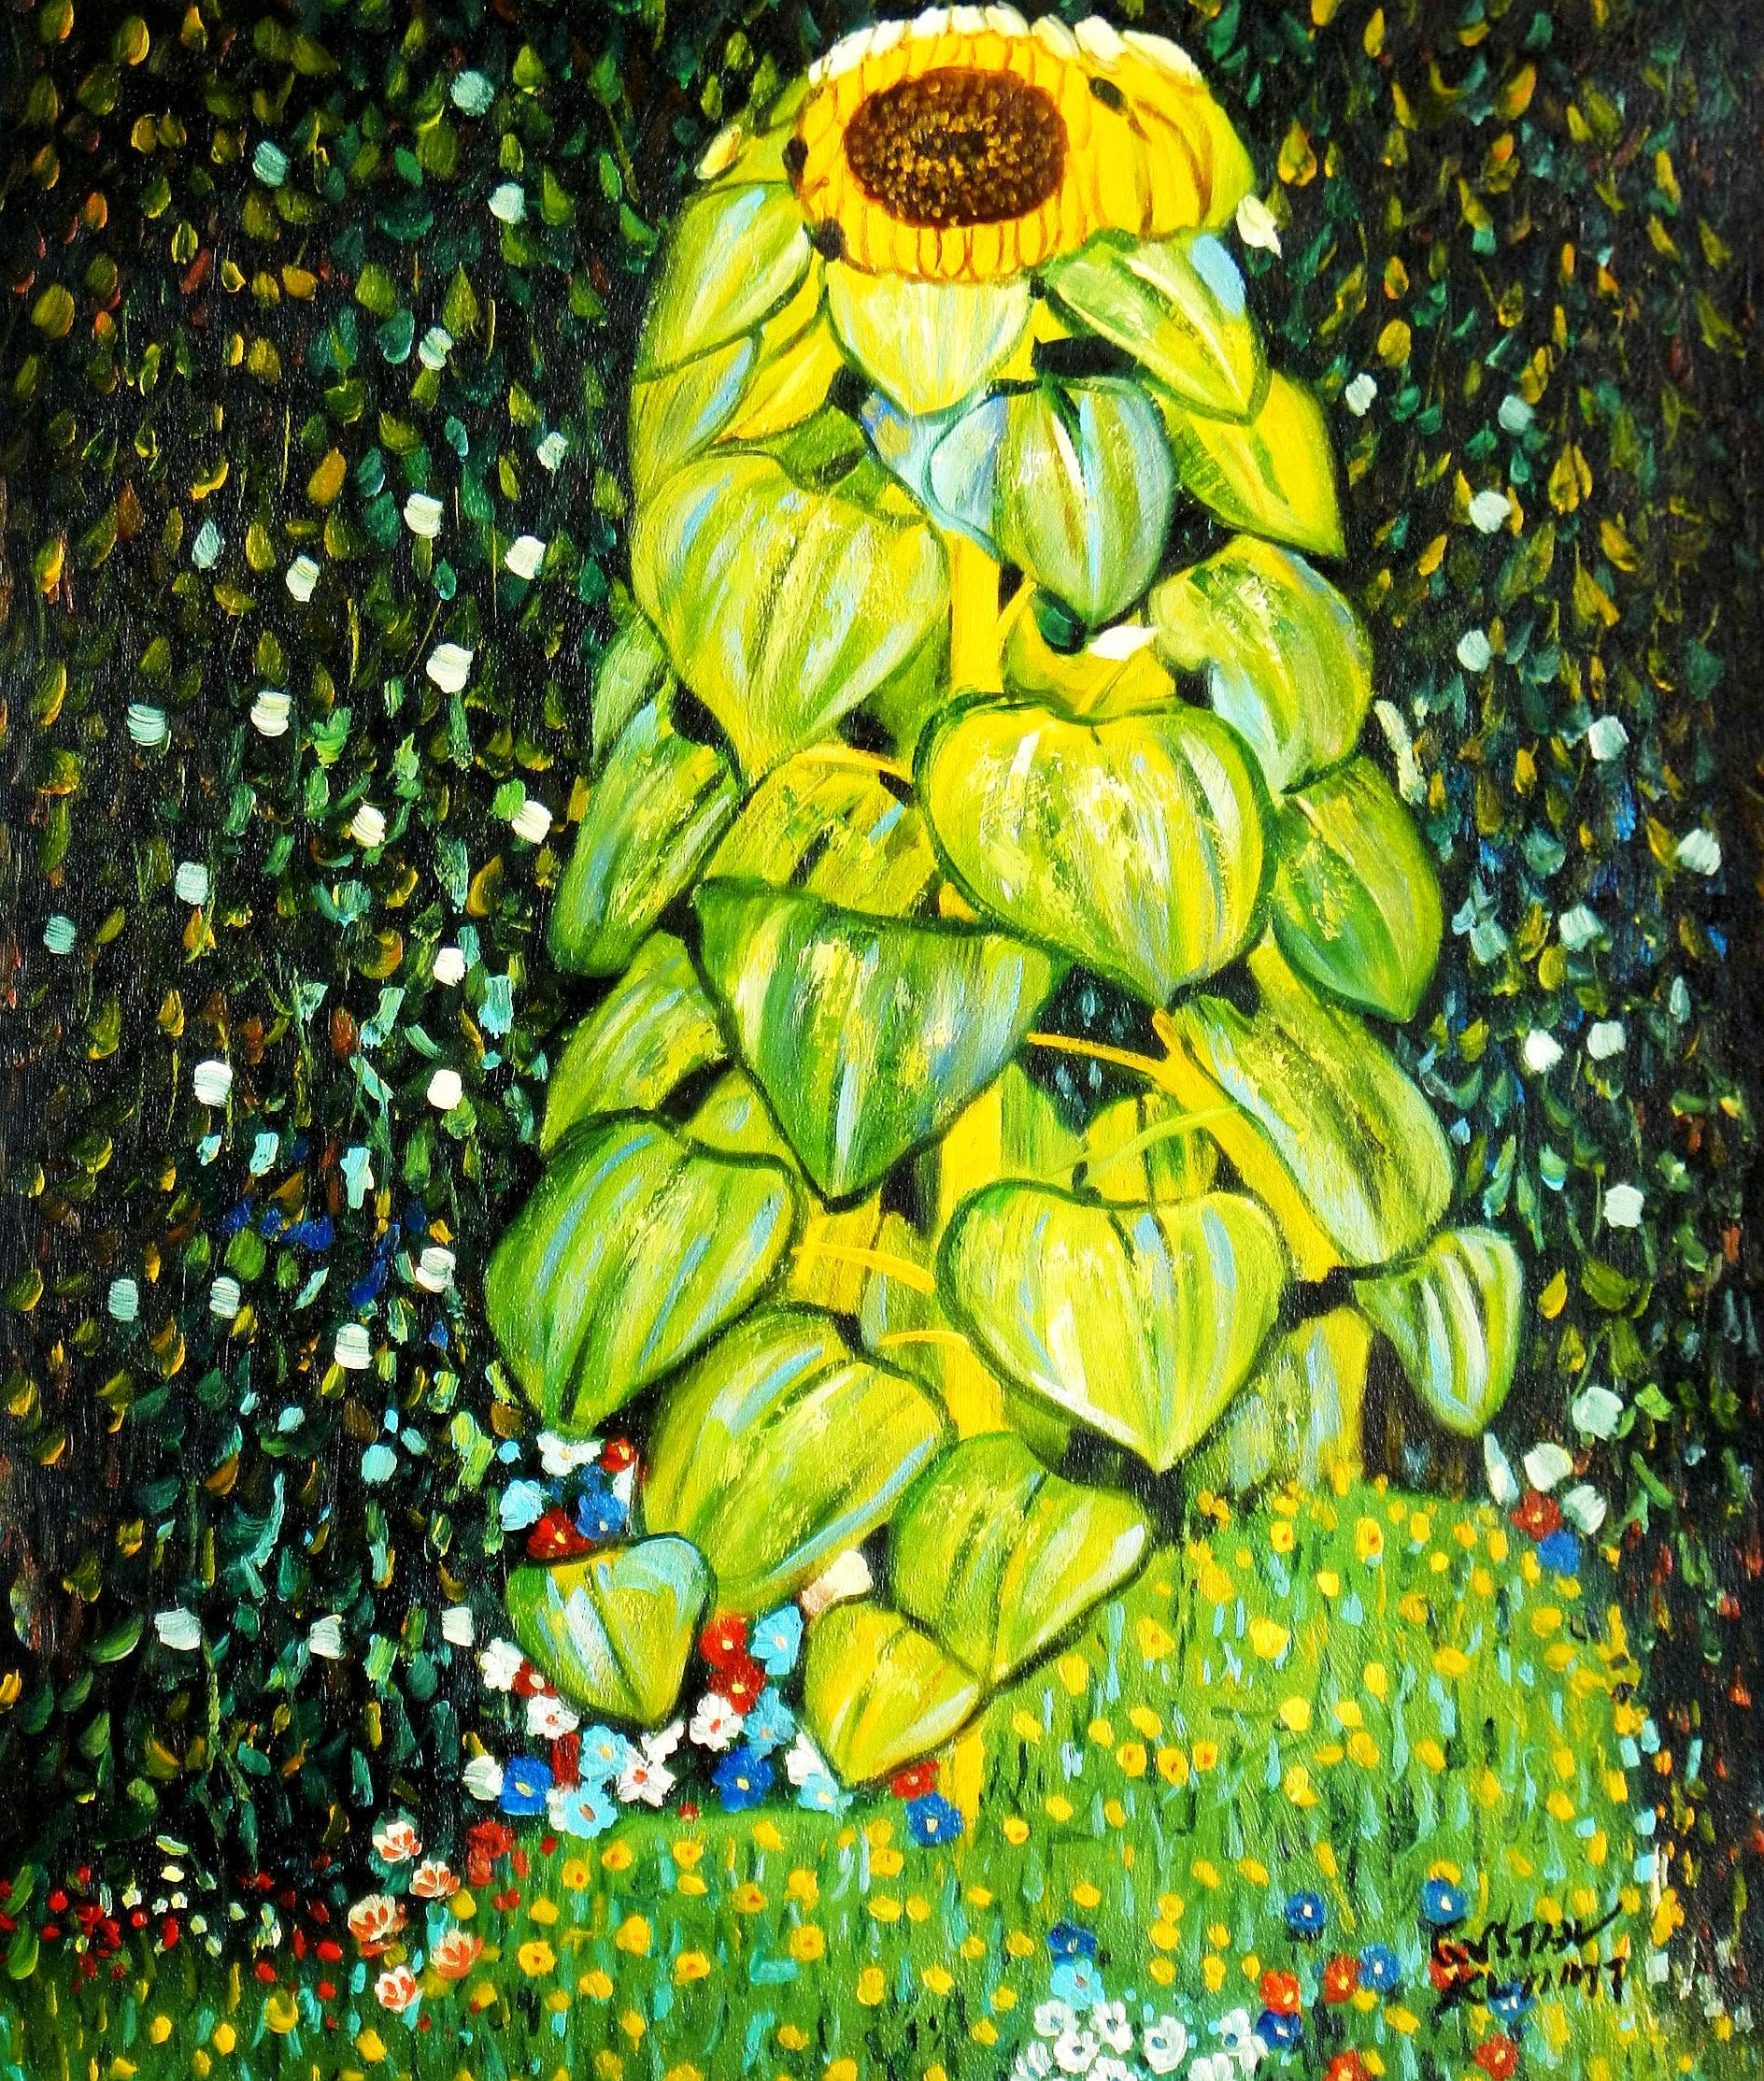 Gustav Klimt - Die Sonnenblume c93275 50x60cm handgemaltes Ölgemälde